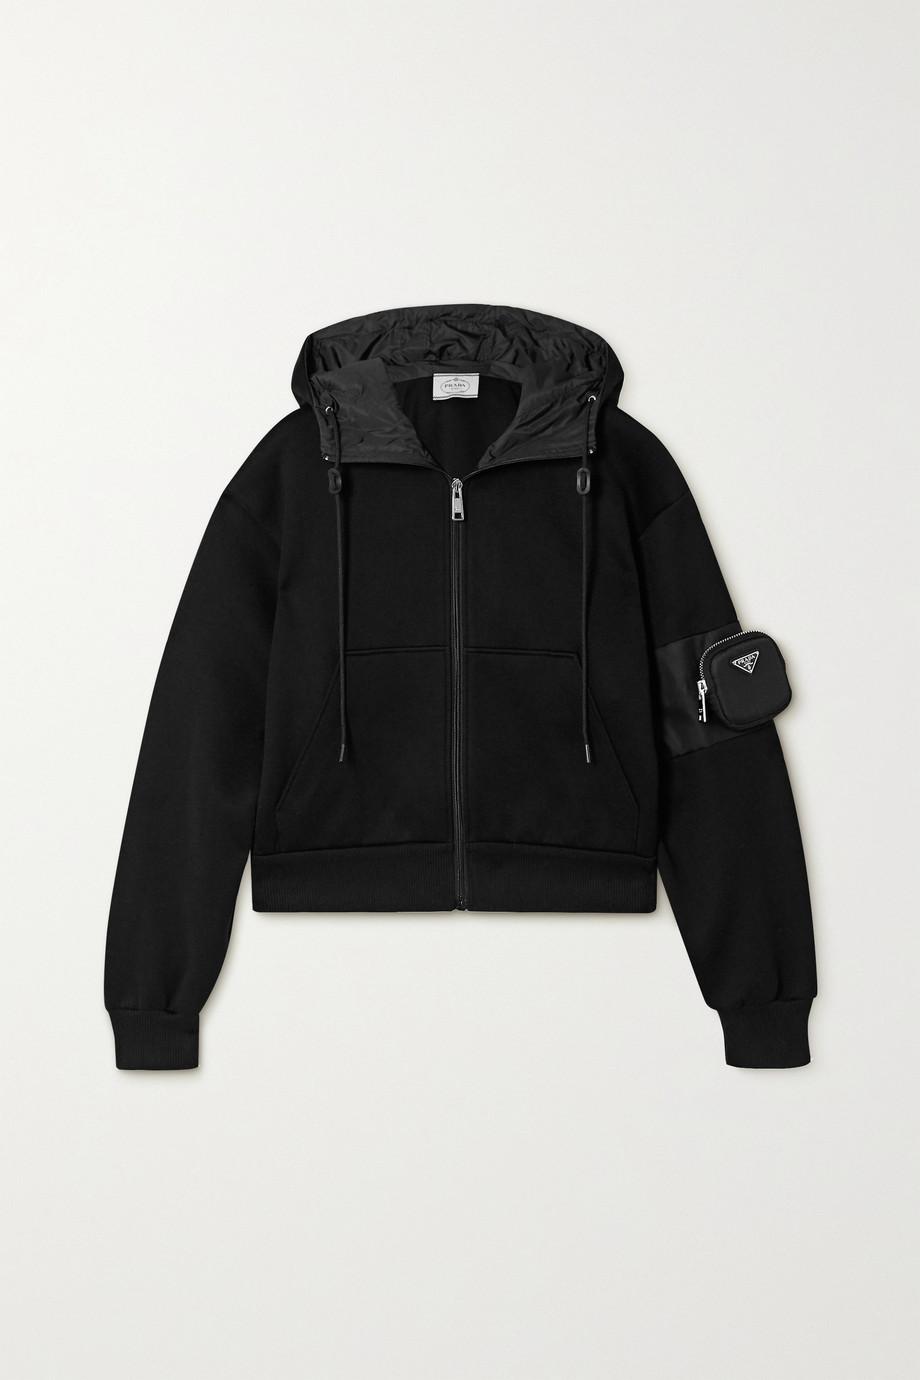 Prada Nylon-paneled cotton-blend jersey hoodie